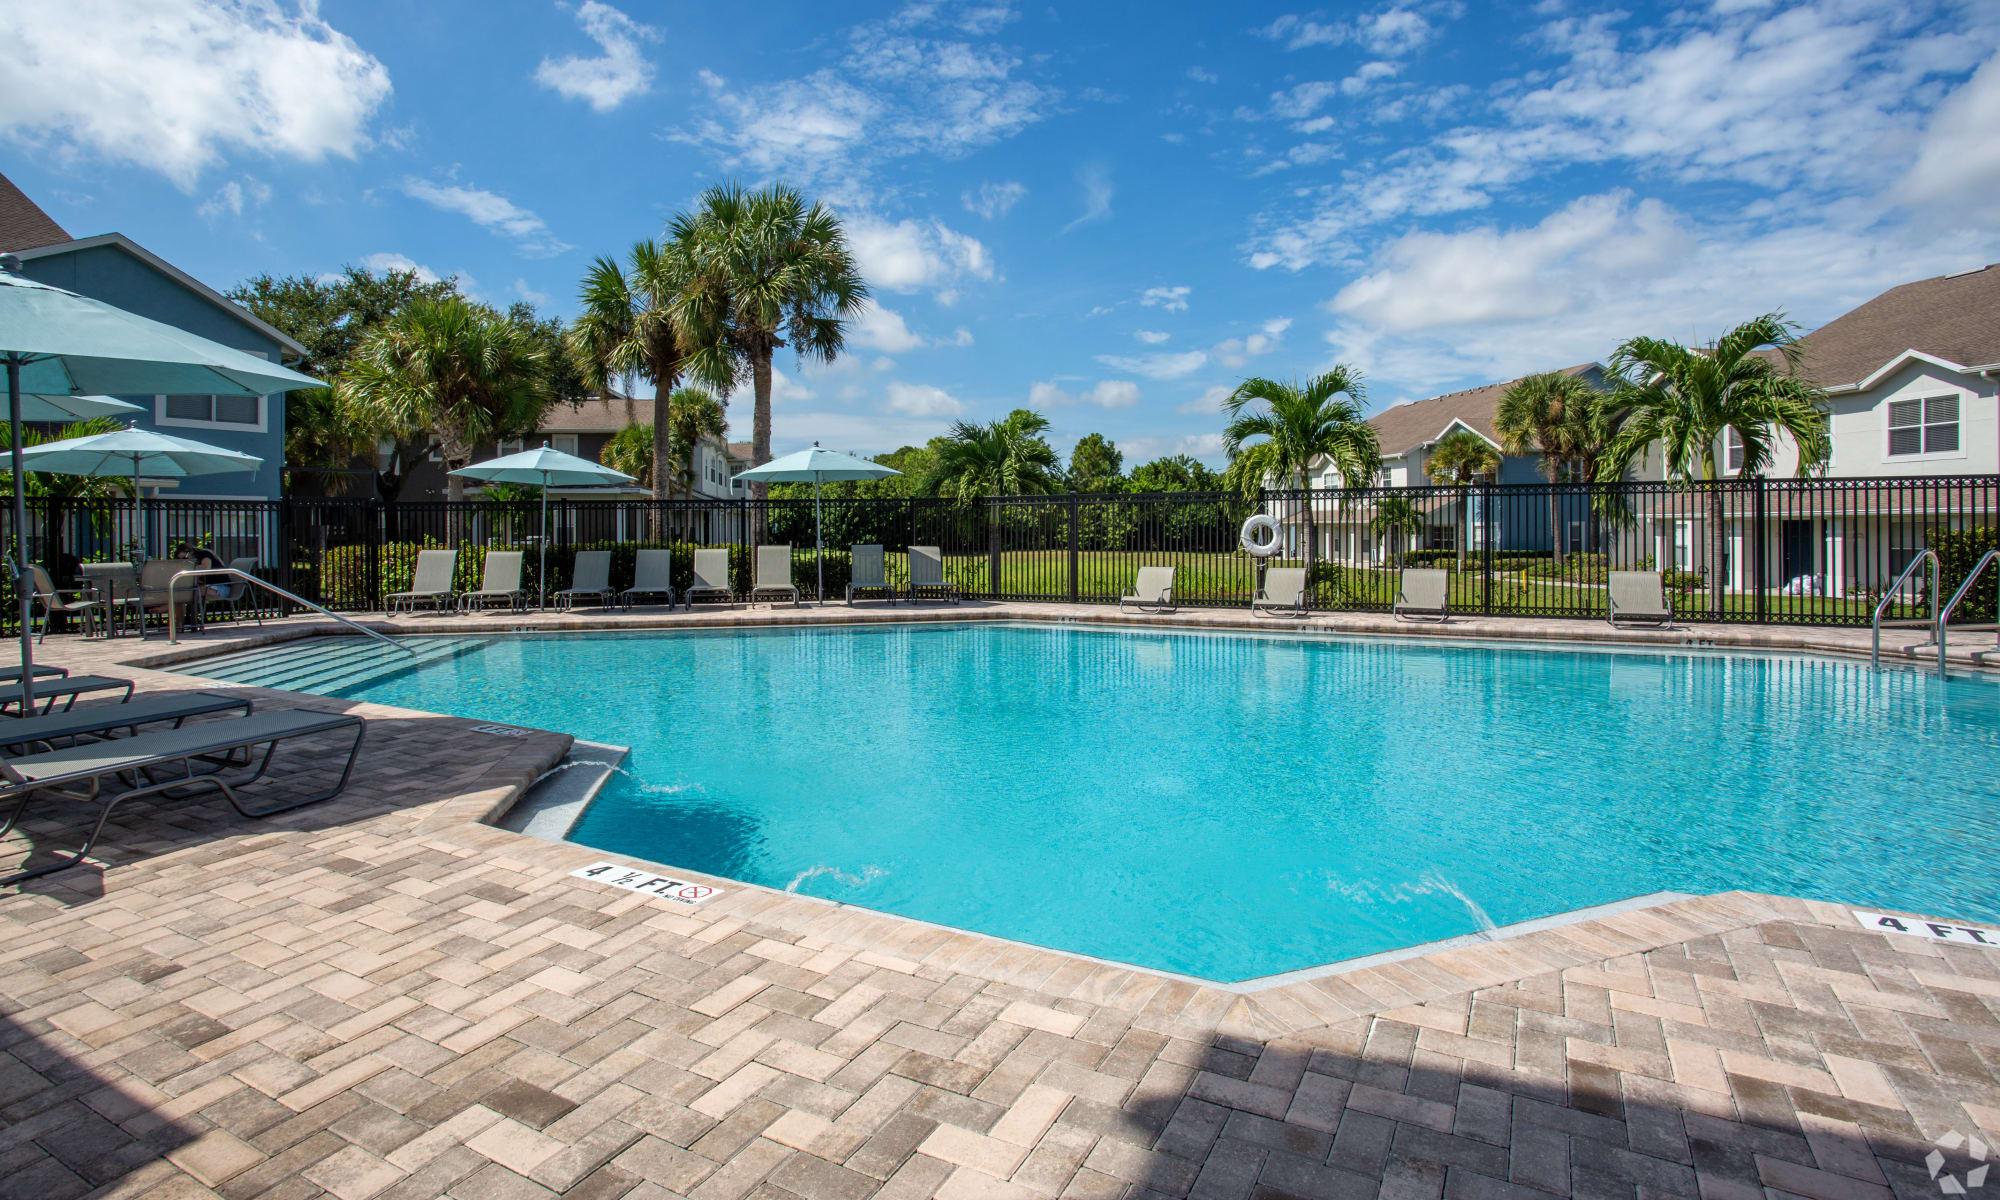 Apartments at Calais Park Apartments in St Petersburg, Florida